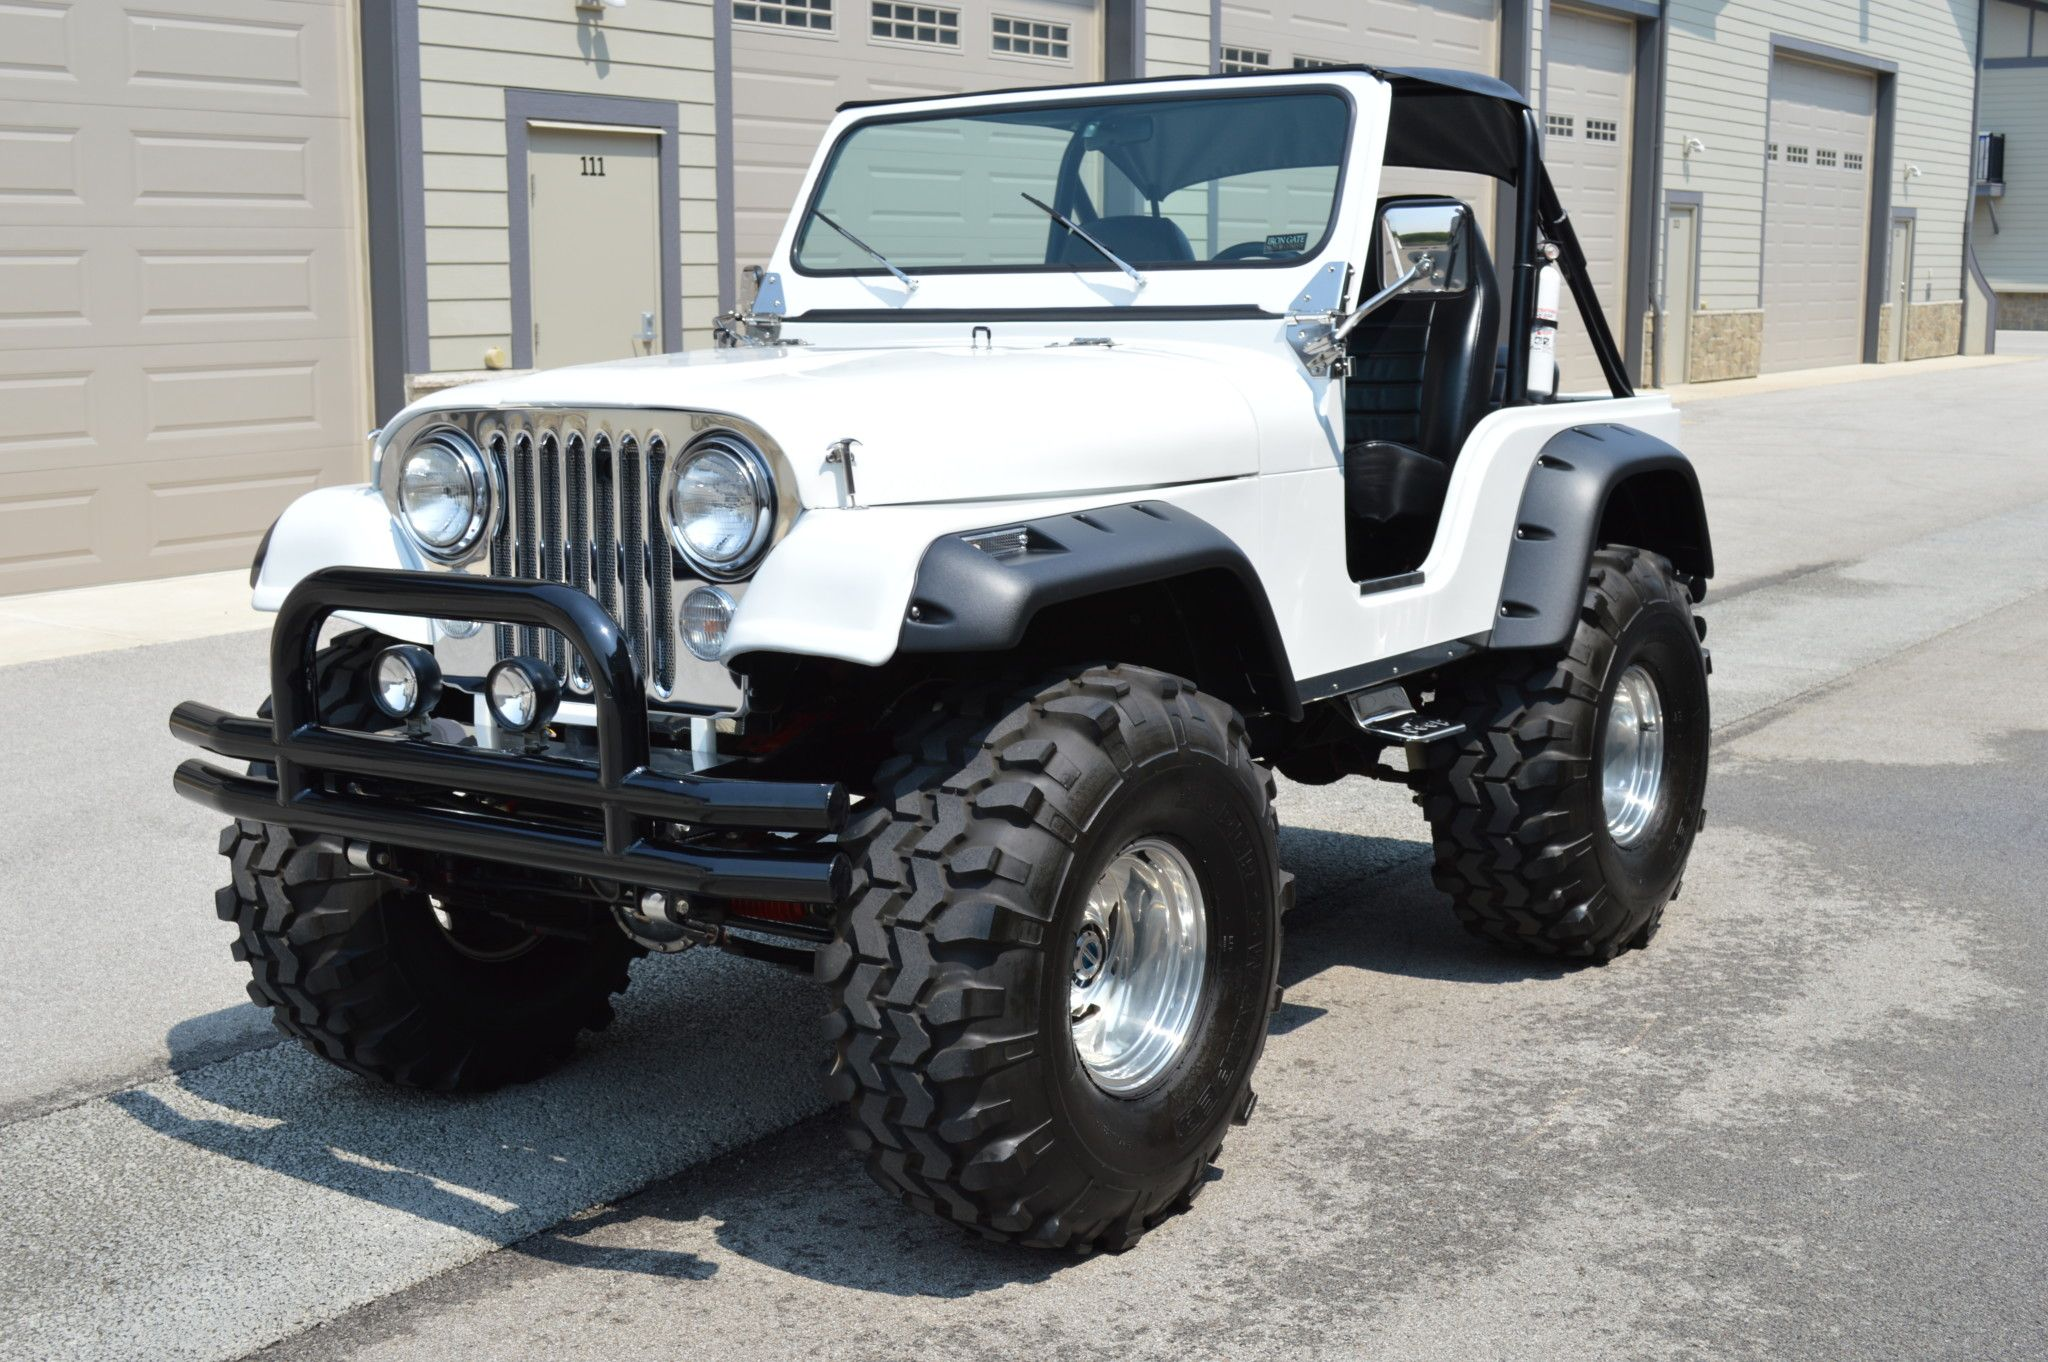 1979 Jeep Cj5 Jeep Cj5 Jeep Cj7 Jeep Cj